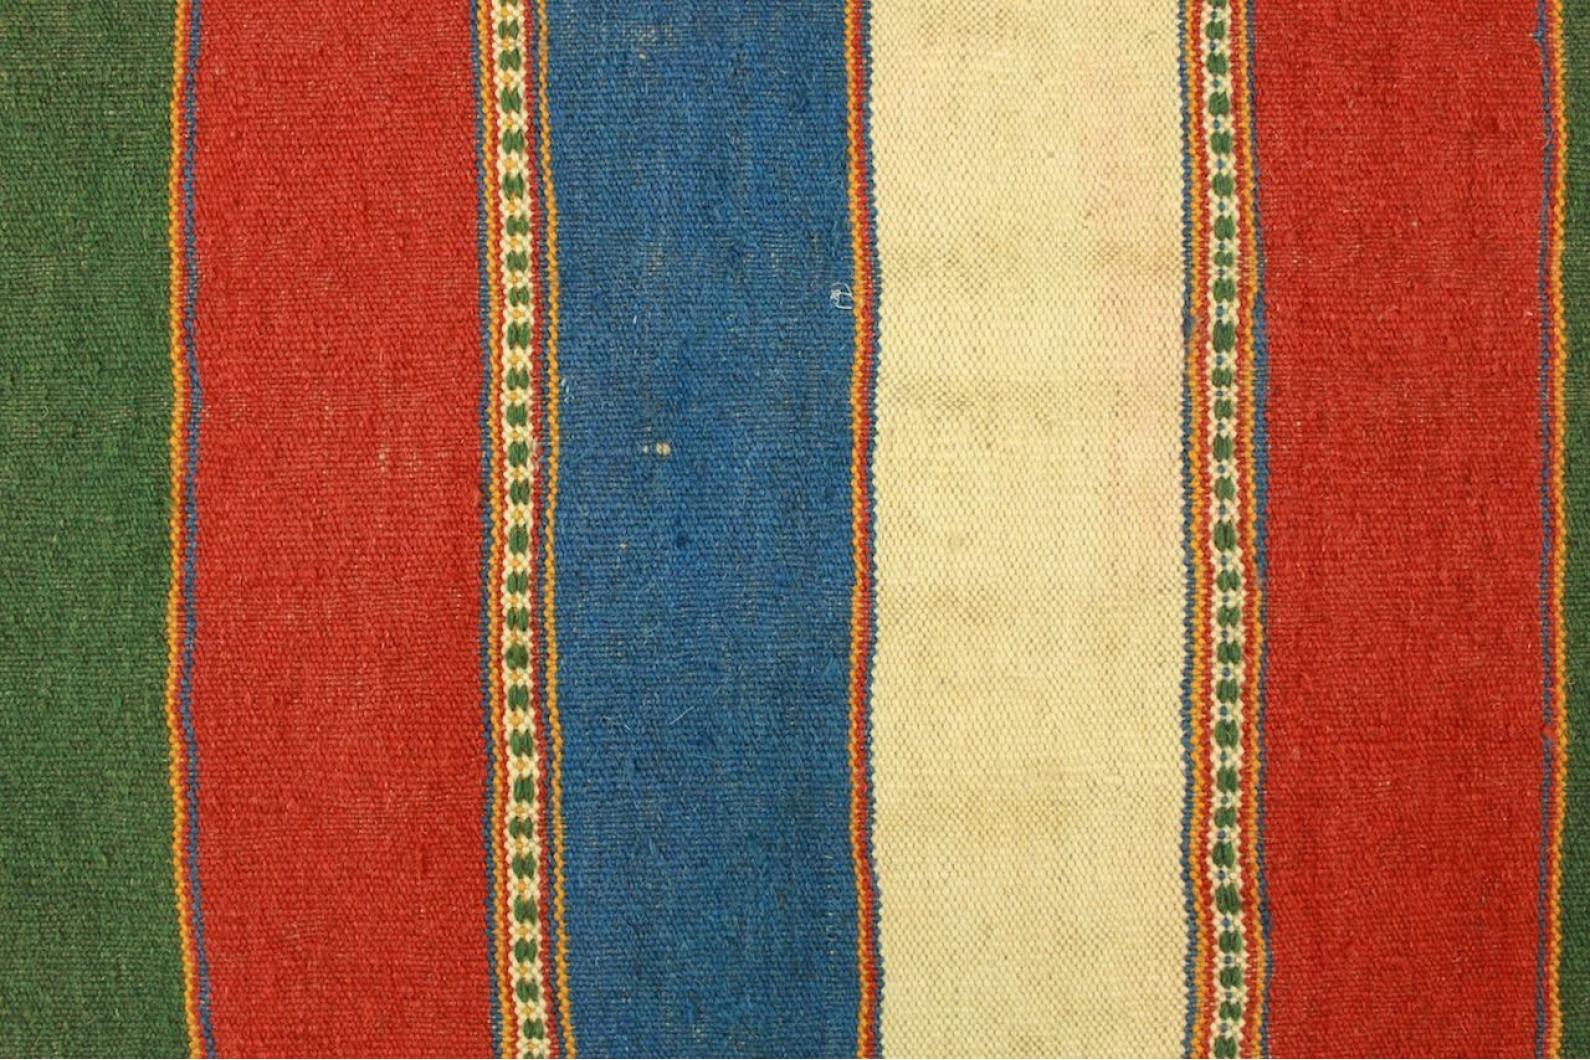 Kilim Rug Orange Green Red Blue In 140x100cm 1 4